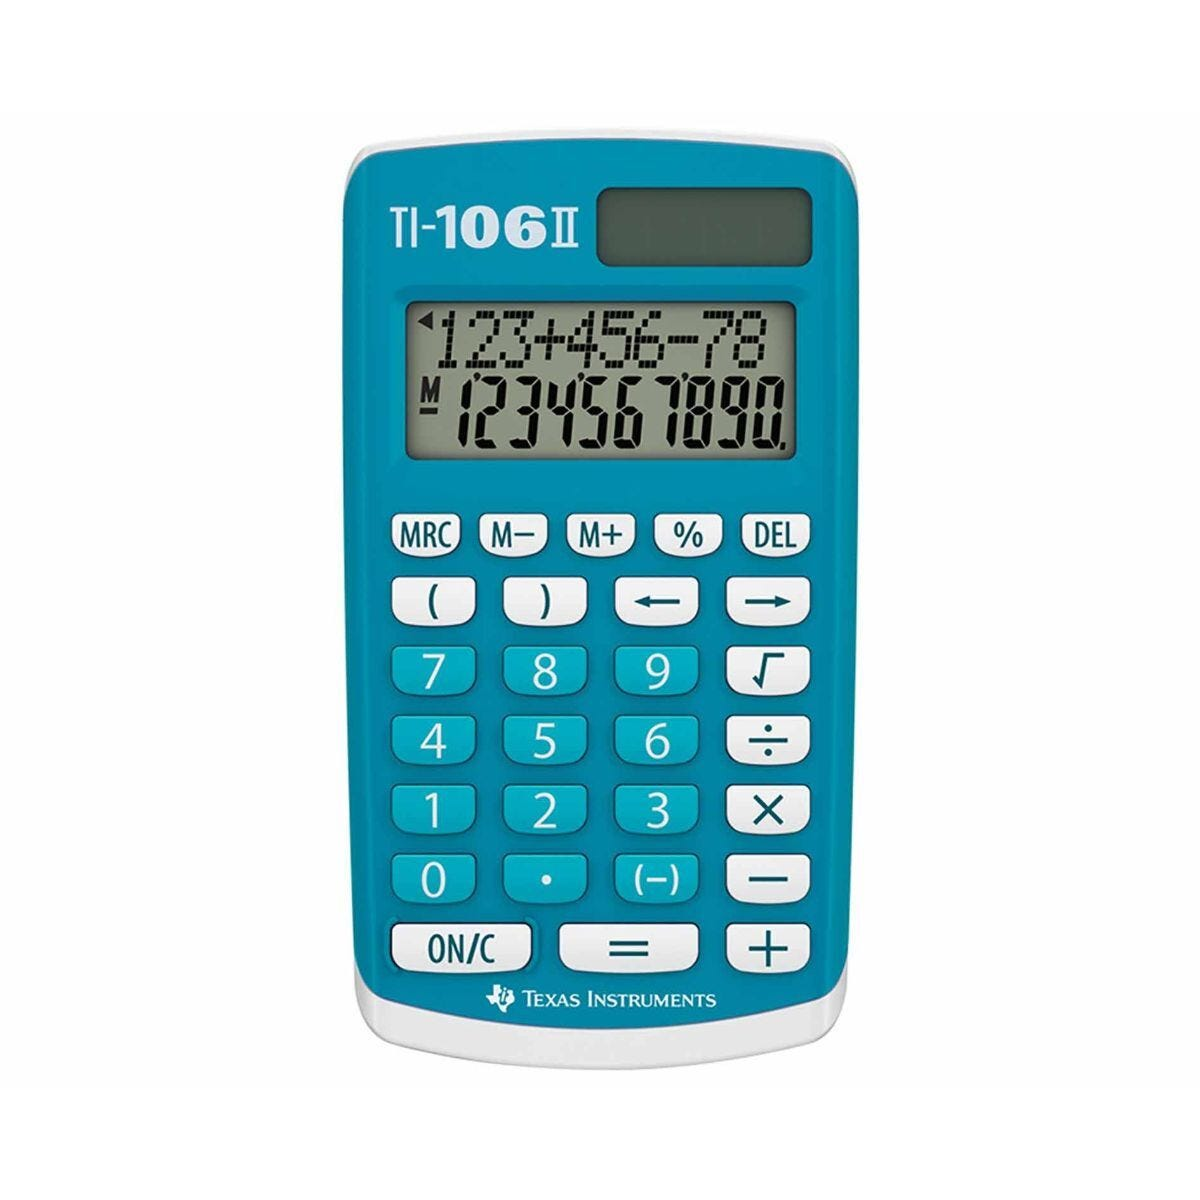 Texas Instruments TI106 II 4 Function Calculator